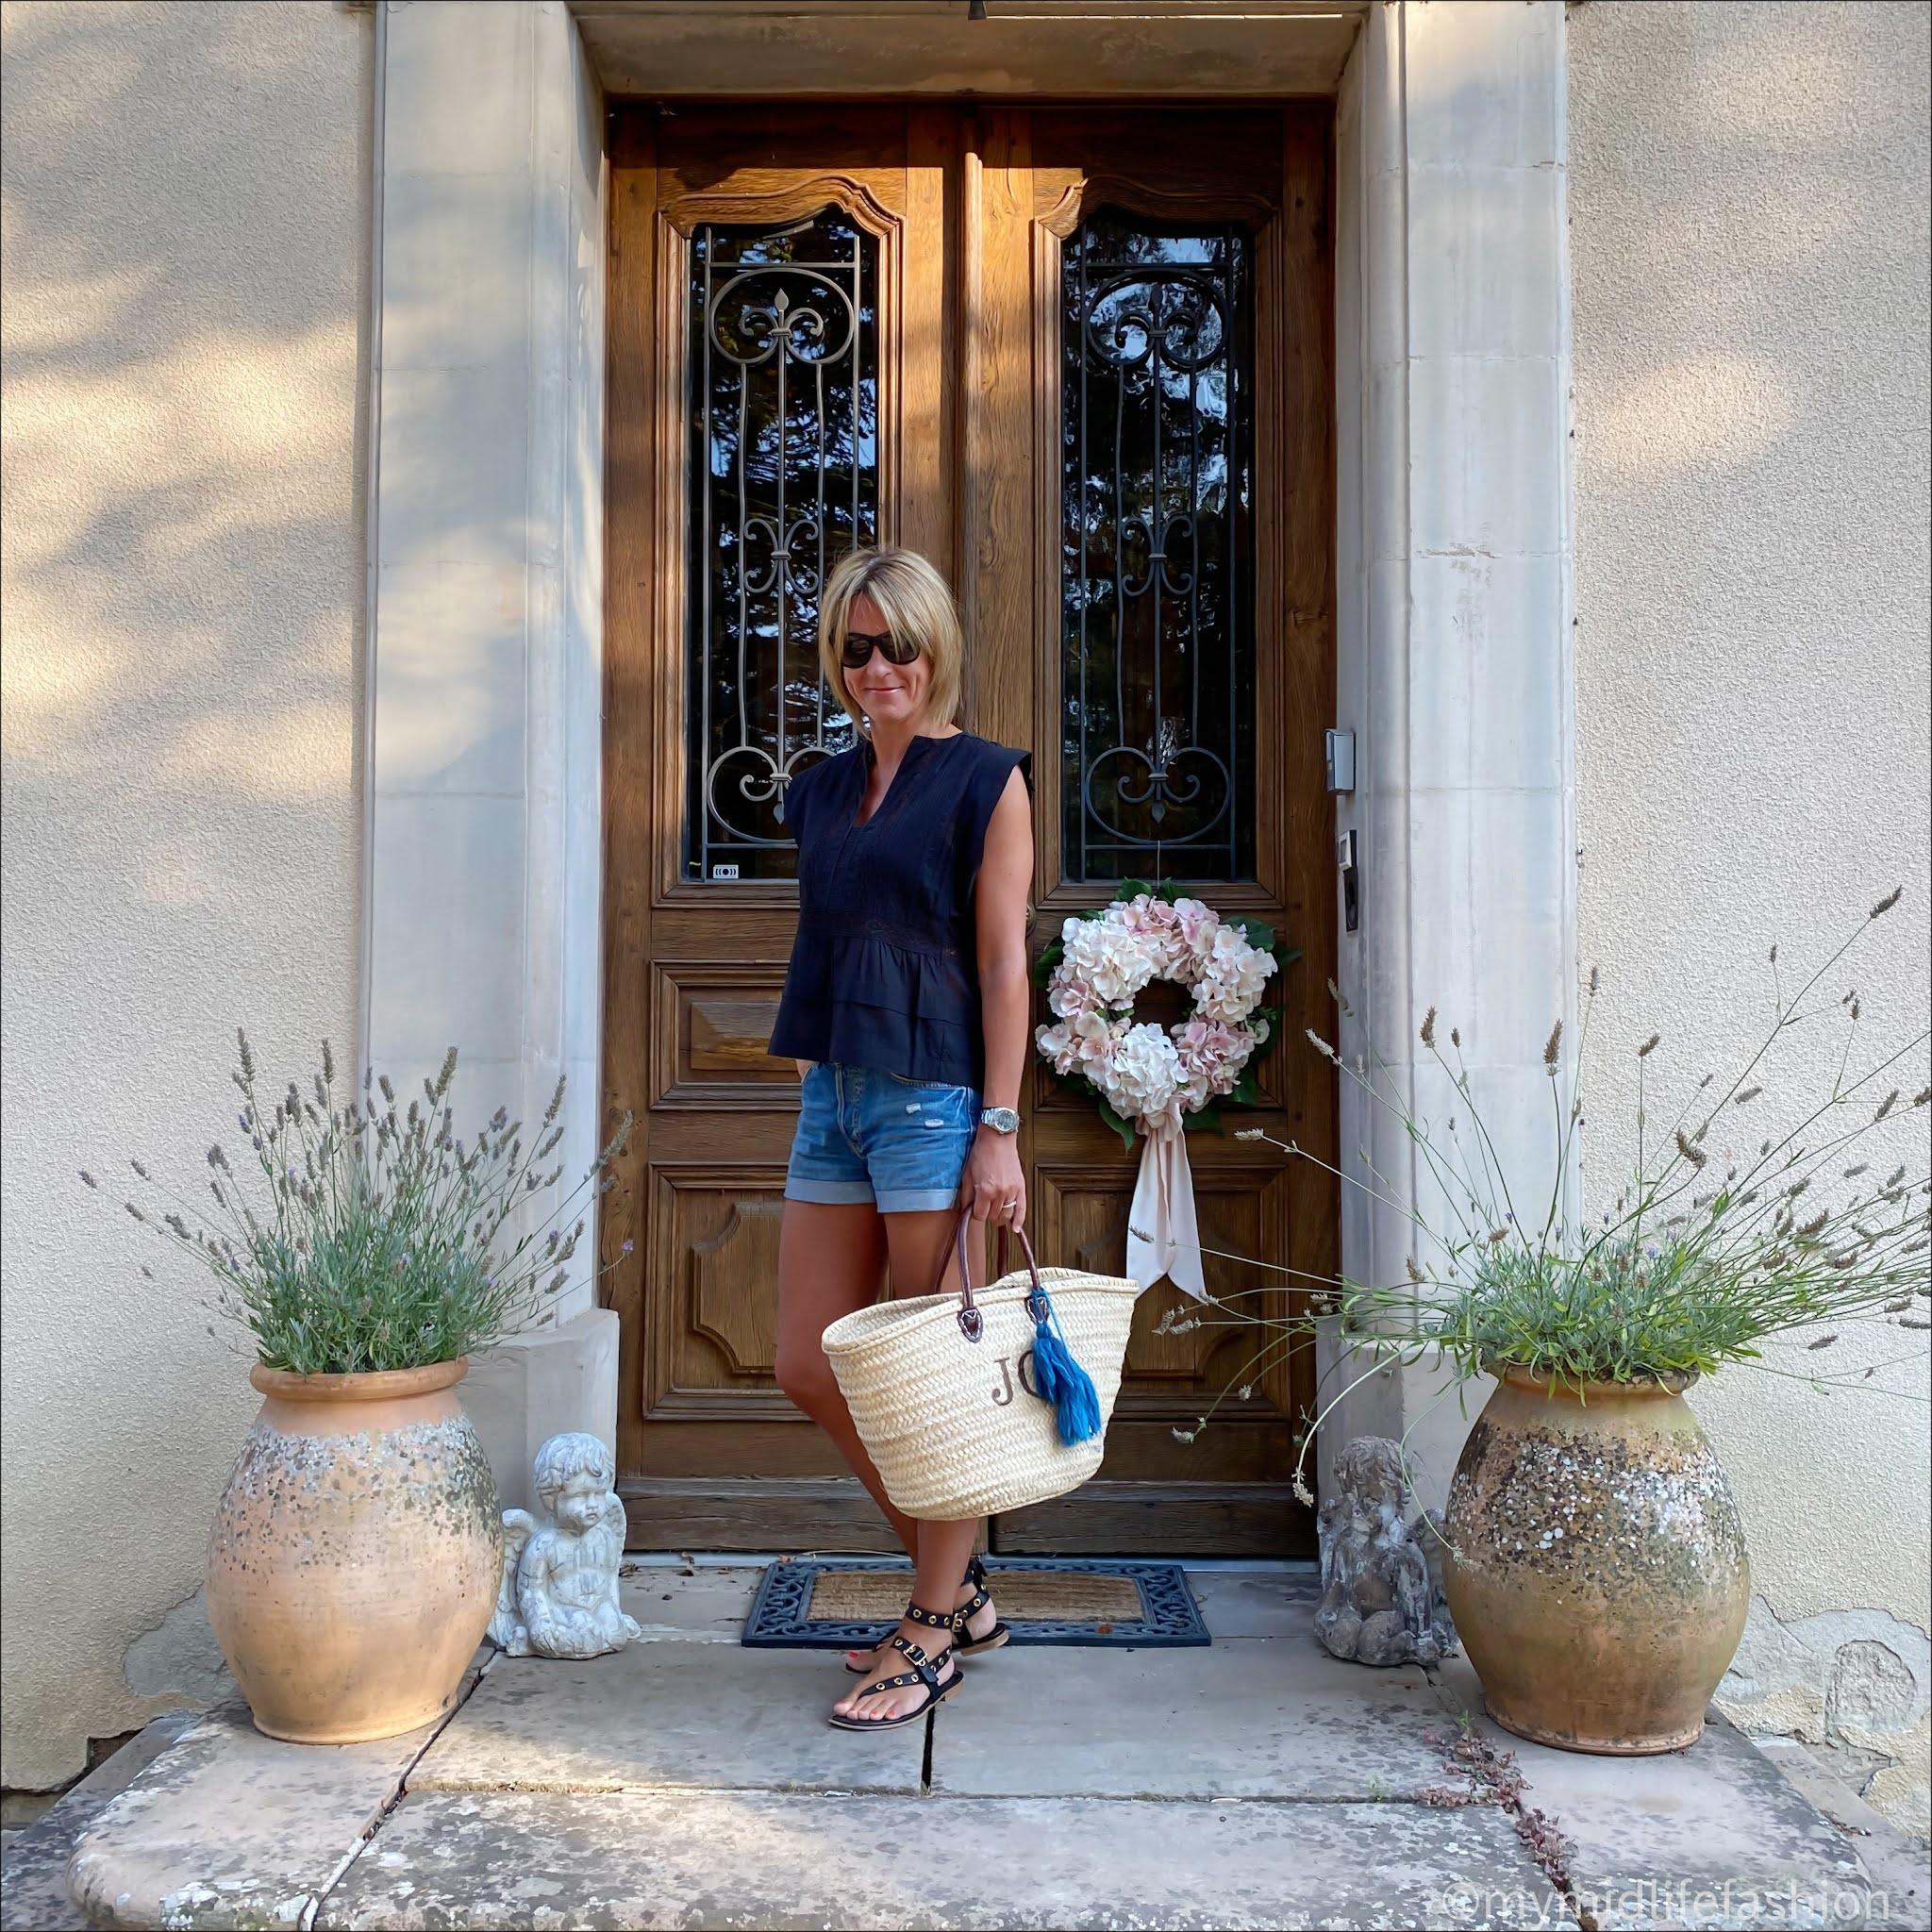 my midlife fashion, h and m conscious denim shorts boyfriend, Isabel Marant Etoile cotton top, initially London covent monogrammed basket, iro Paris eyelet leather sandals